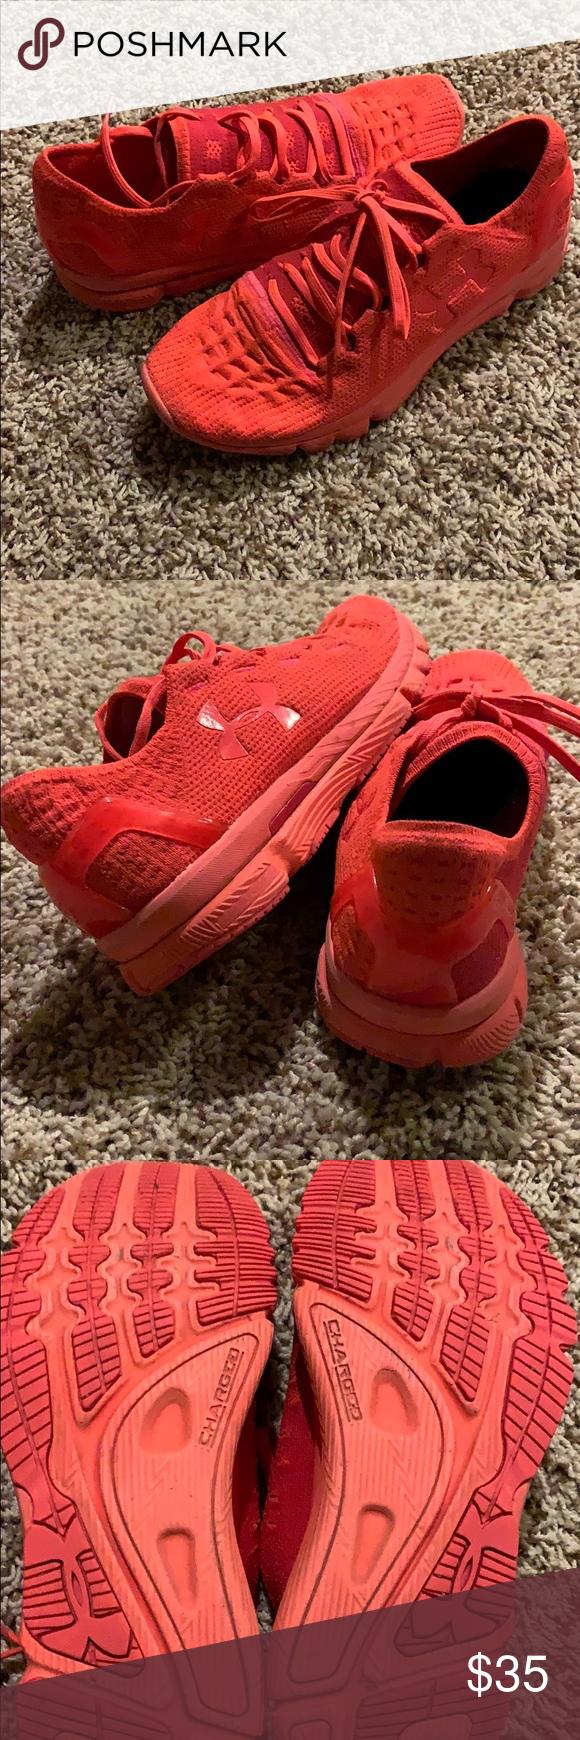 Women's Under Armour tennis shoes